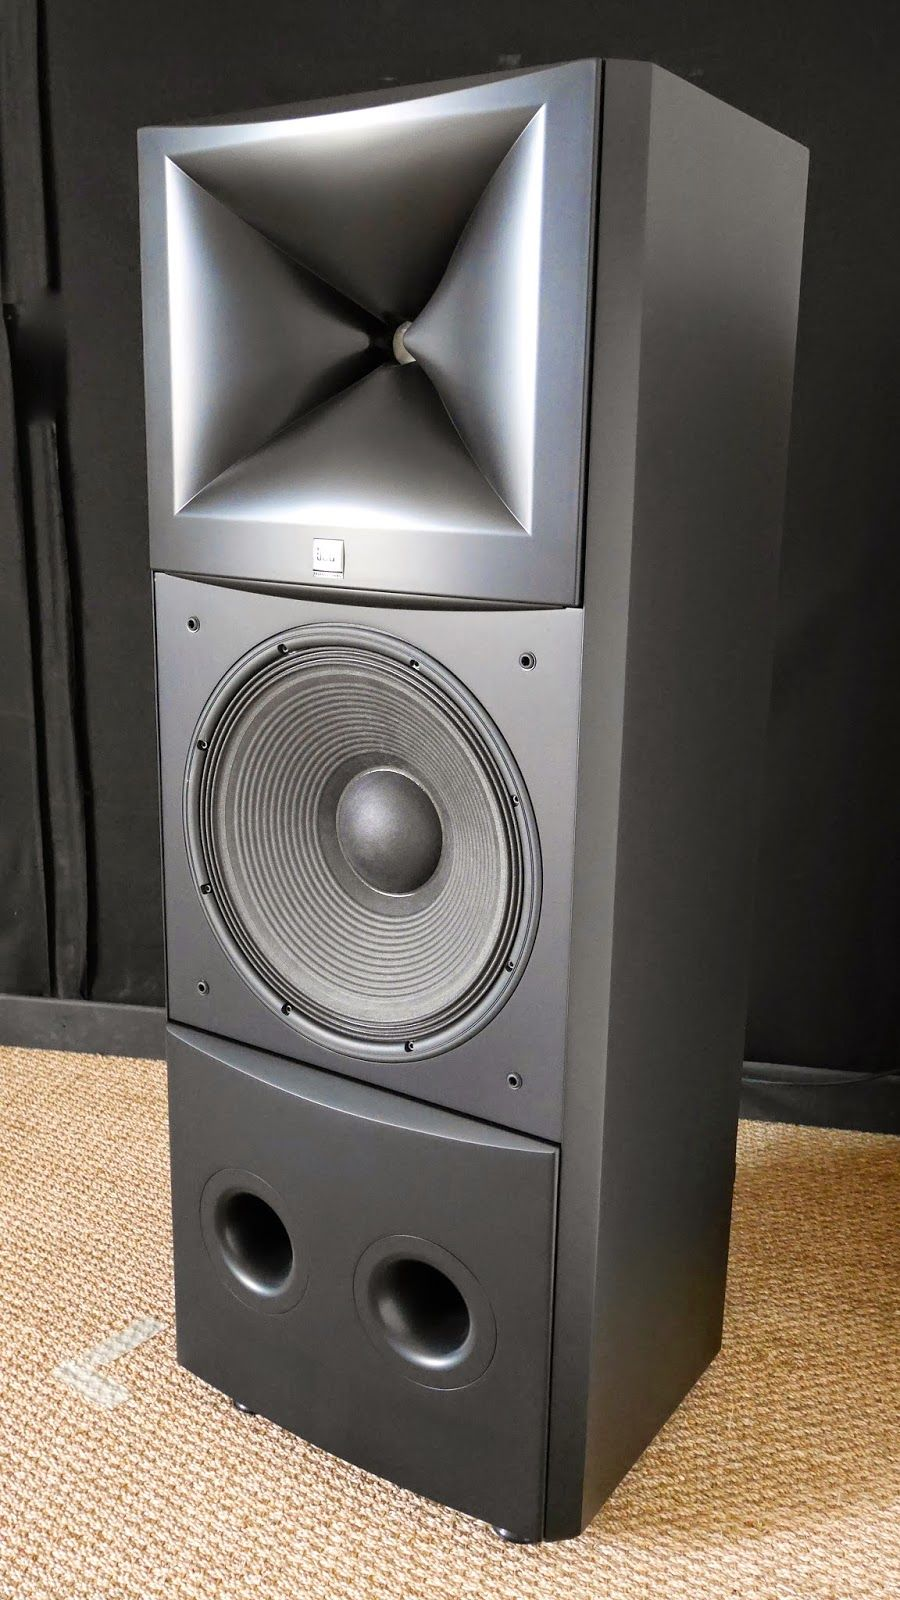 Jbl M2 Reference Audio In 2018 Pinterest Loudspeaker Electronics Gt Tv Video Home Speakers Subwoofers Audiophile Monitor Bookshelf Stereo Floor